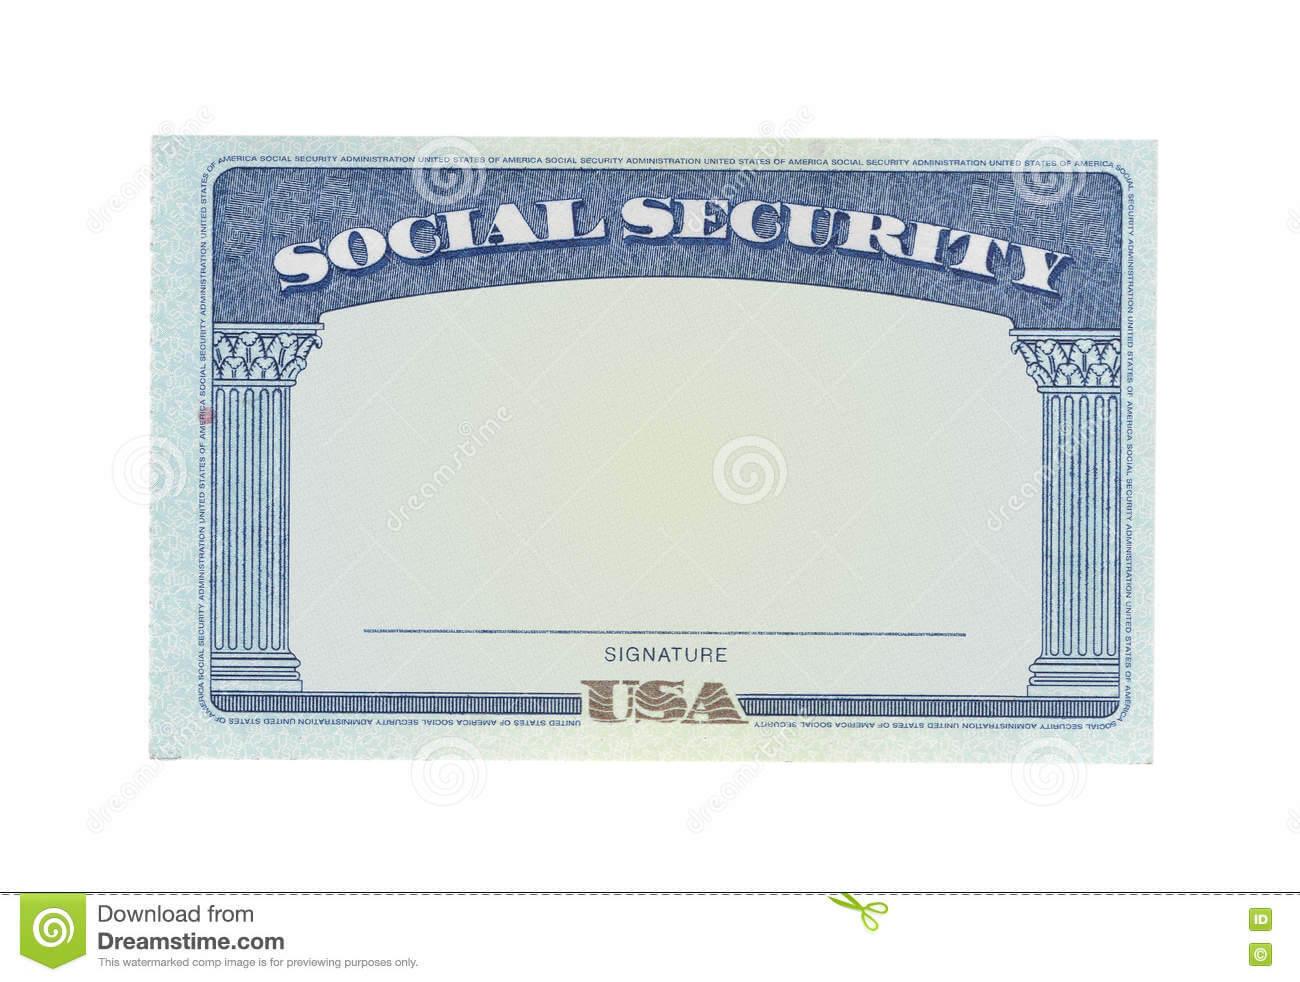 Blank Social Security Card Stock Photos - Download 122 In Blank Social Security Card Template Download